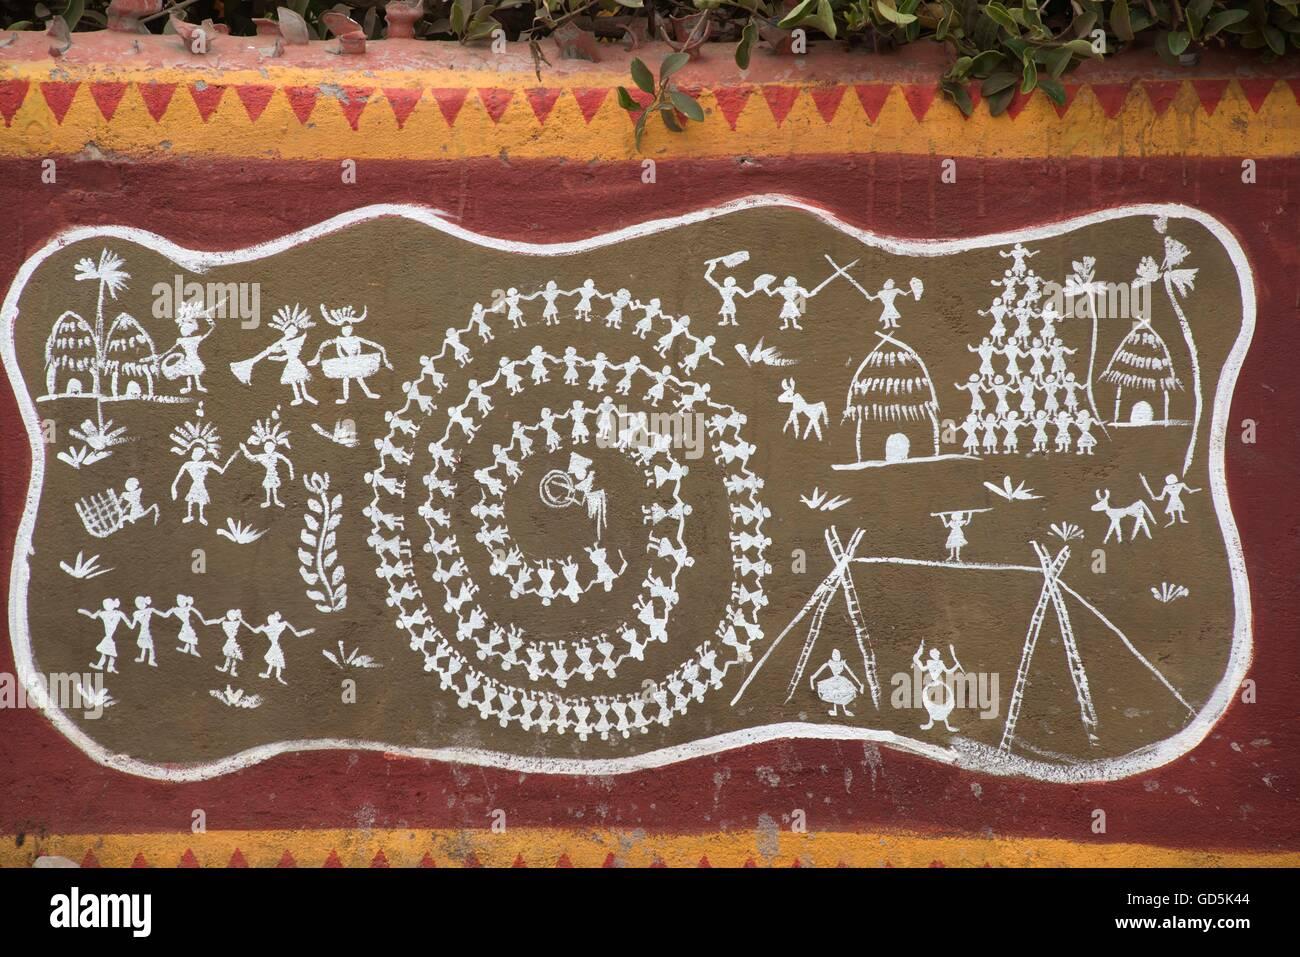 Warli painting, puri, orissa, india, asia - Stock Image